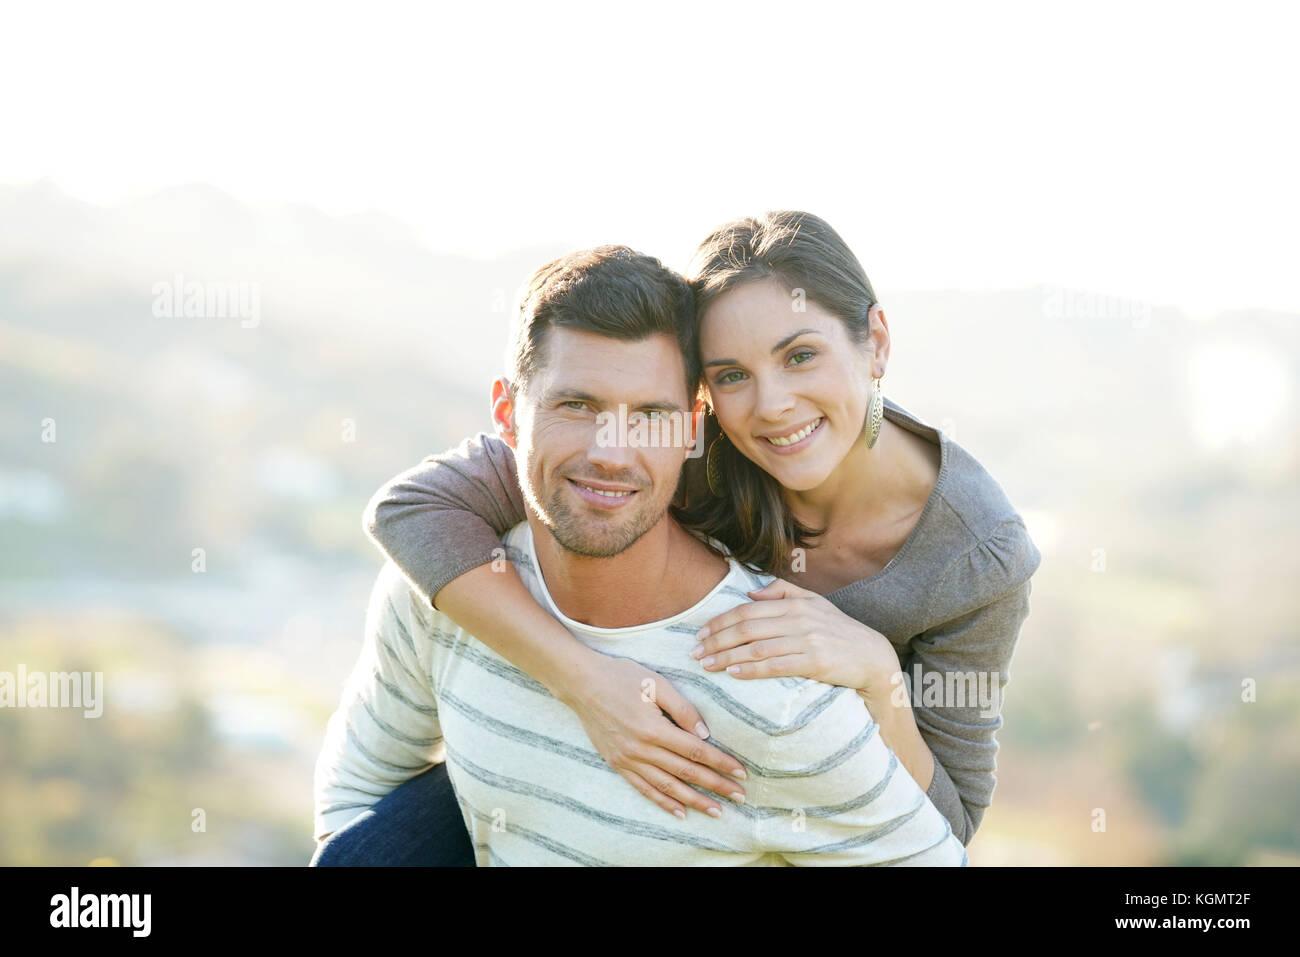 Retrato del hombre alegre dando piggyback ride para novia Imagen De Stock